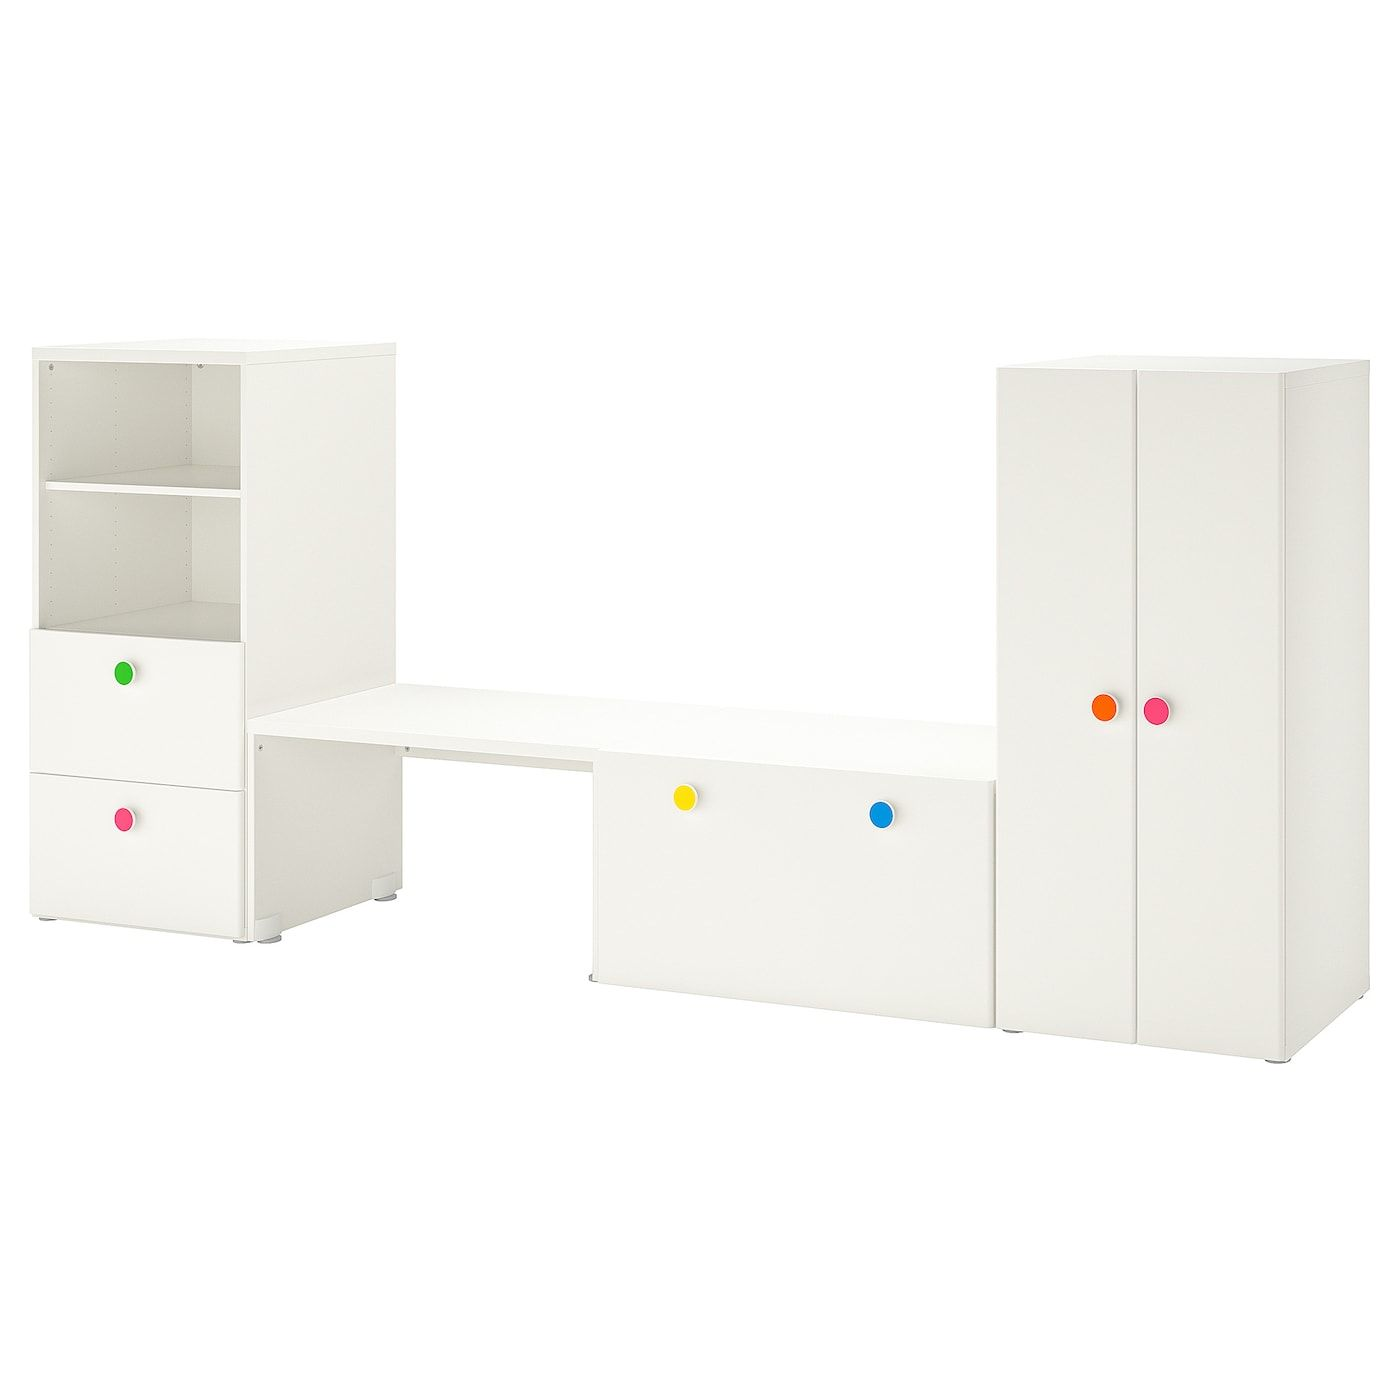 Armadietti In Plastica Ikea.Stuva Folja Combinazione Con Panca Bianco Idee Ikea Ikea E